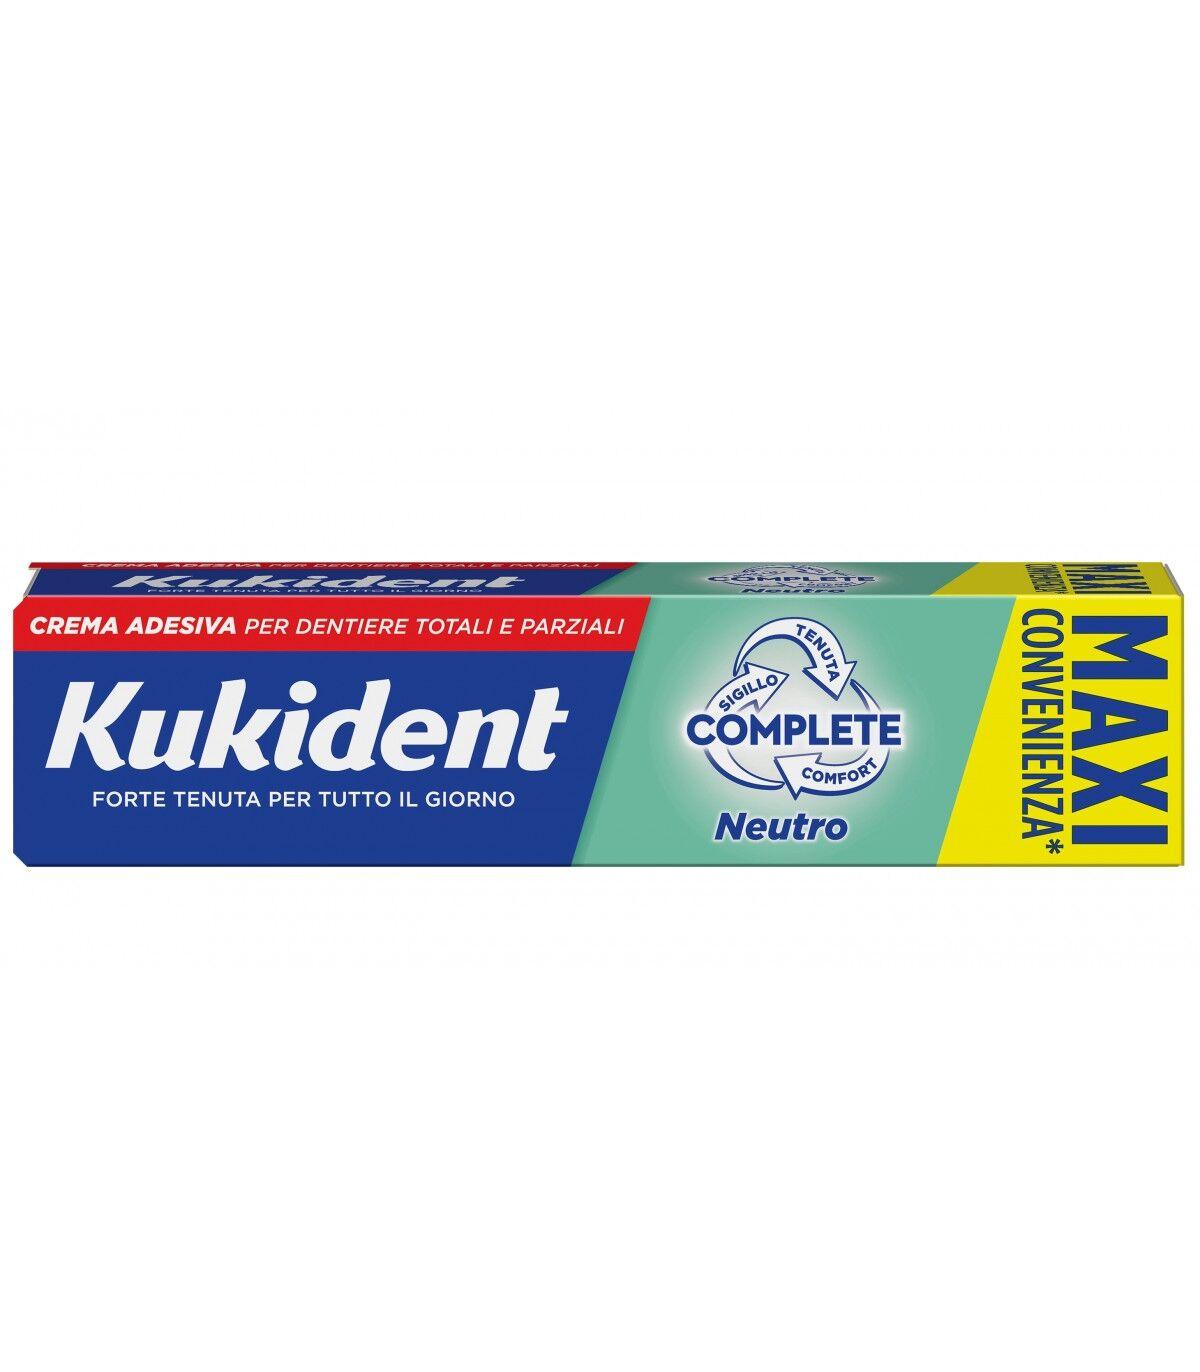 Procter & Gamble Kukident Neutro Complete crema adesiva per protesi dentali (70 g)